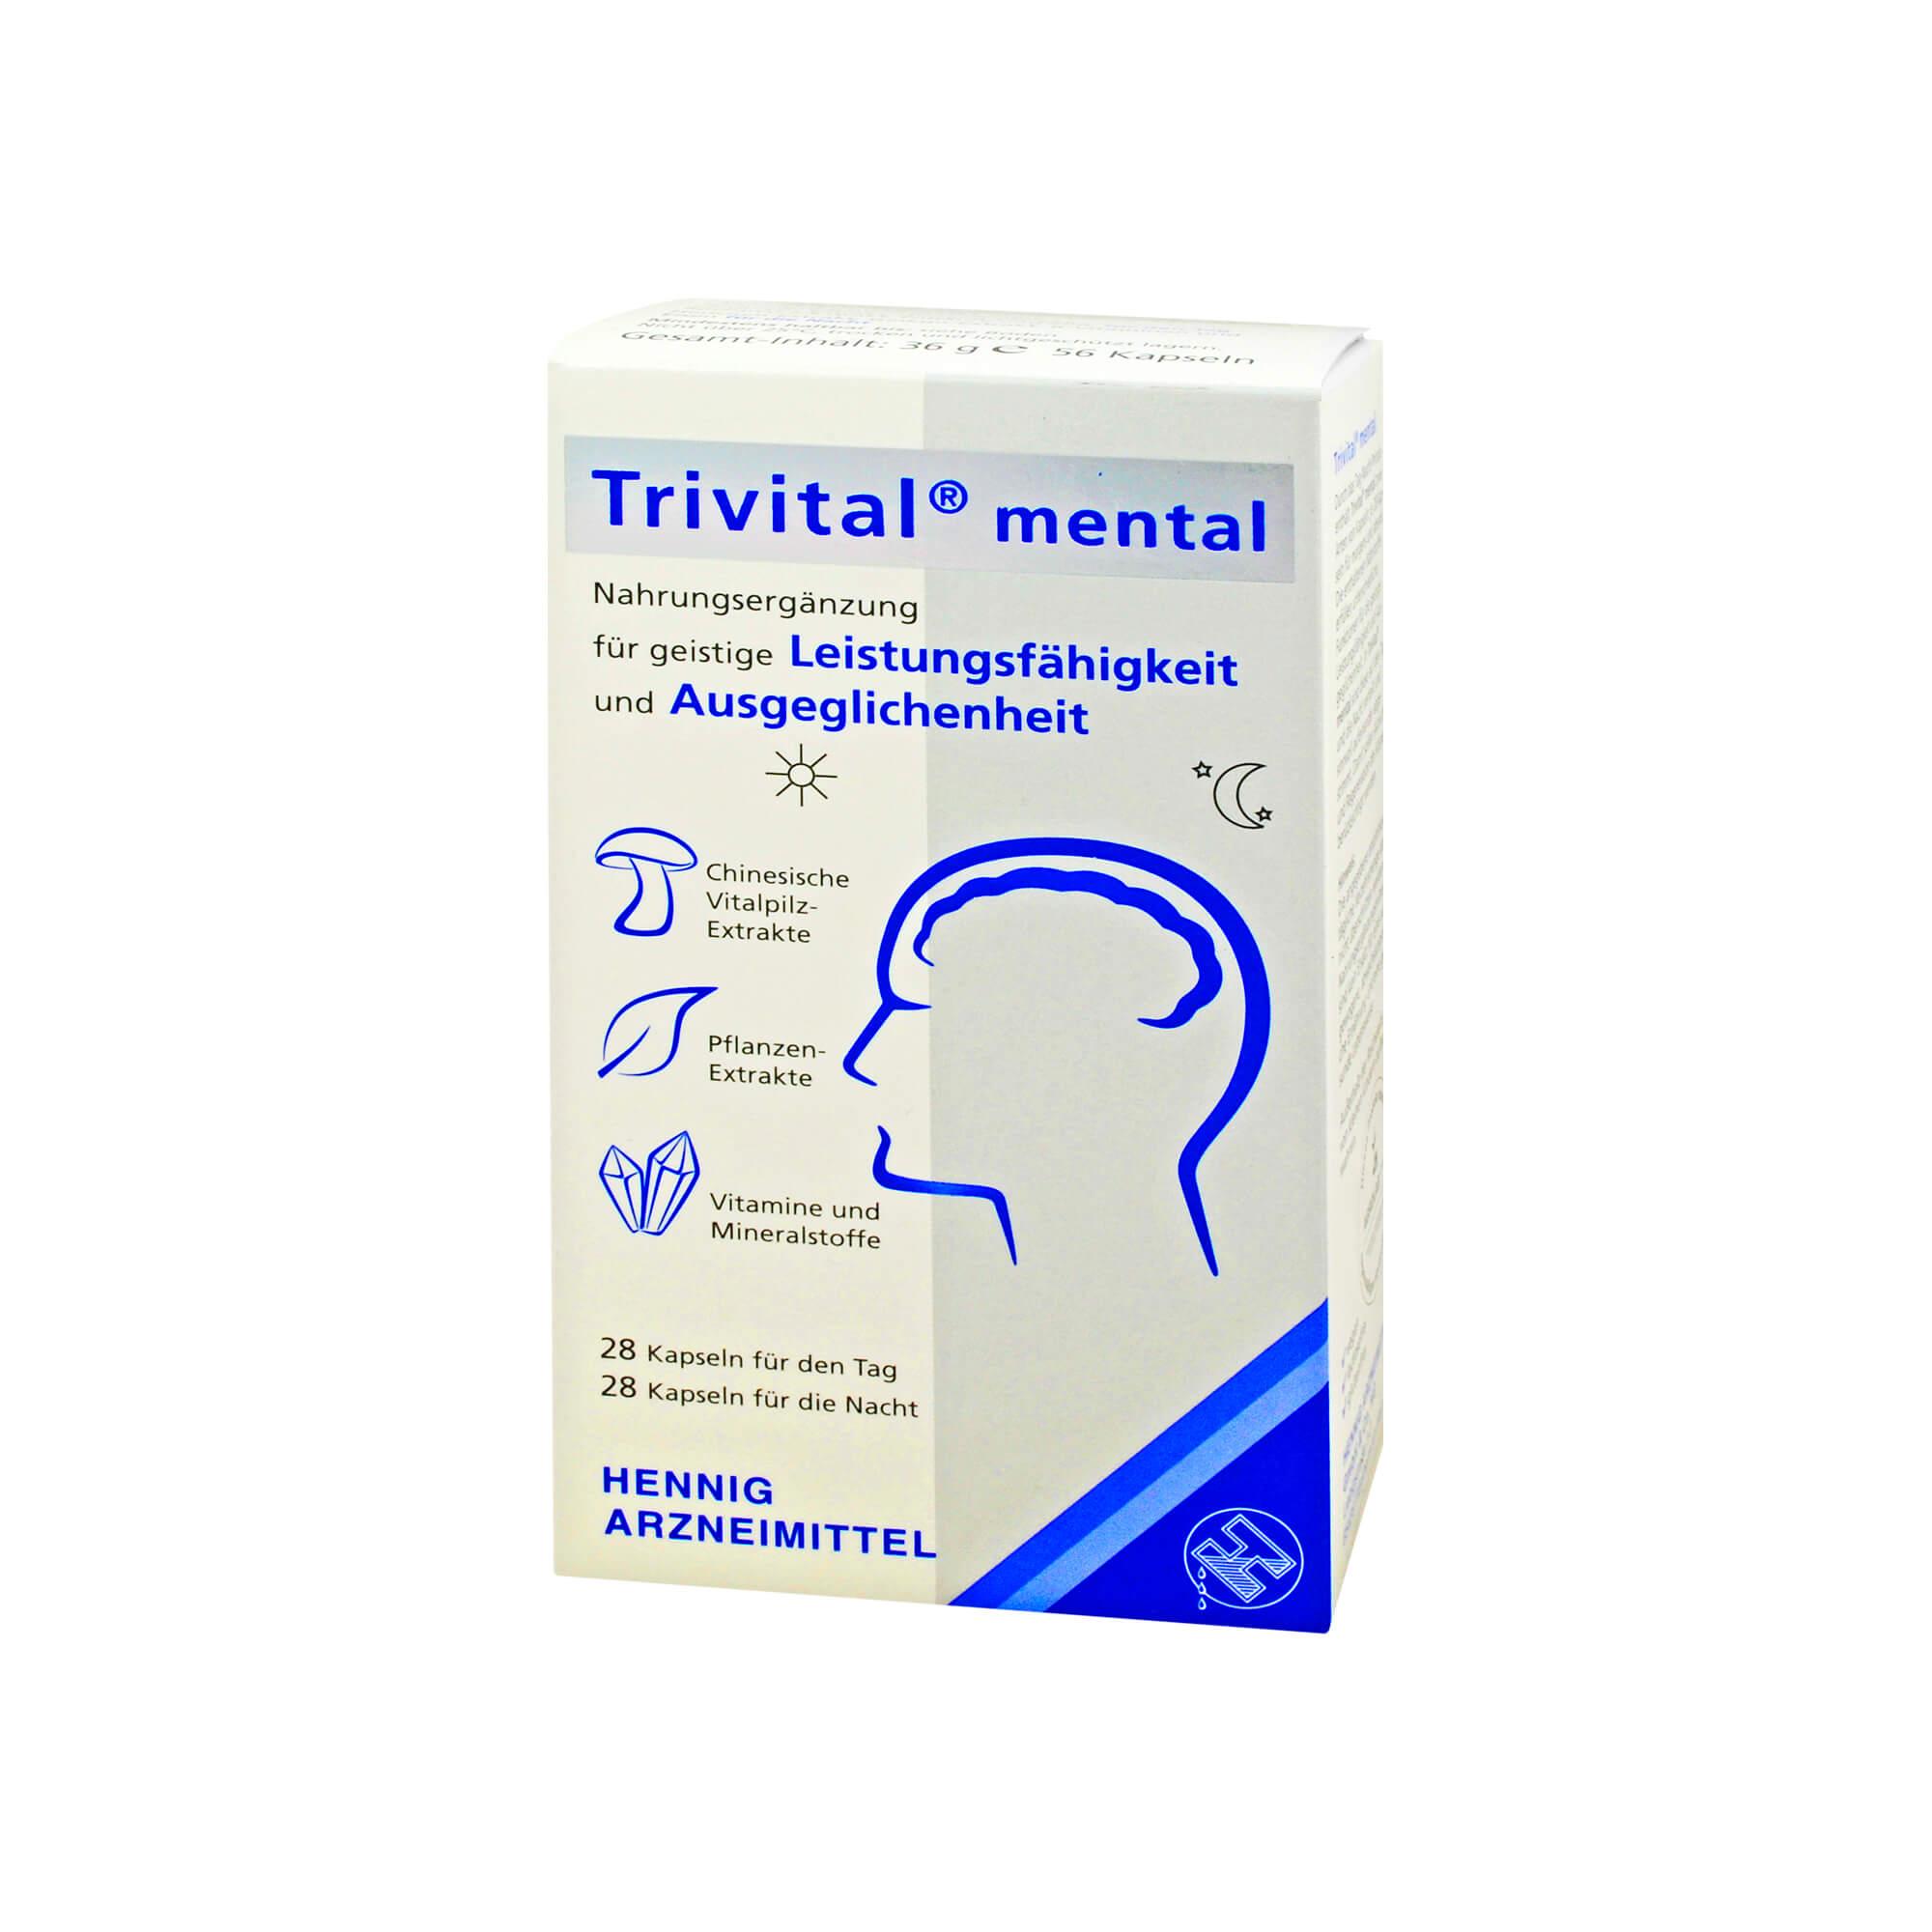 Trivital Mental